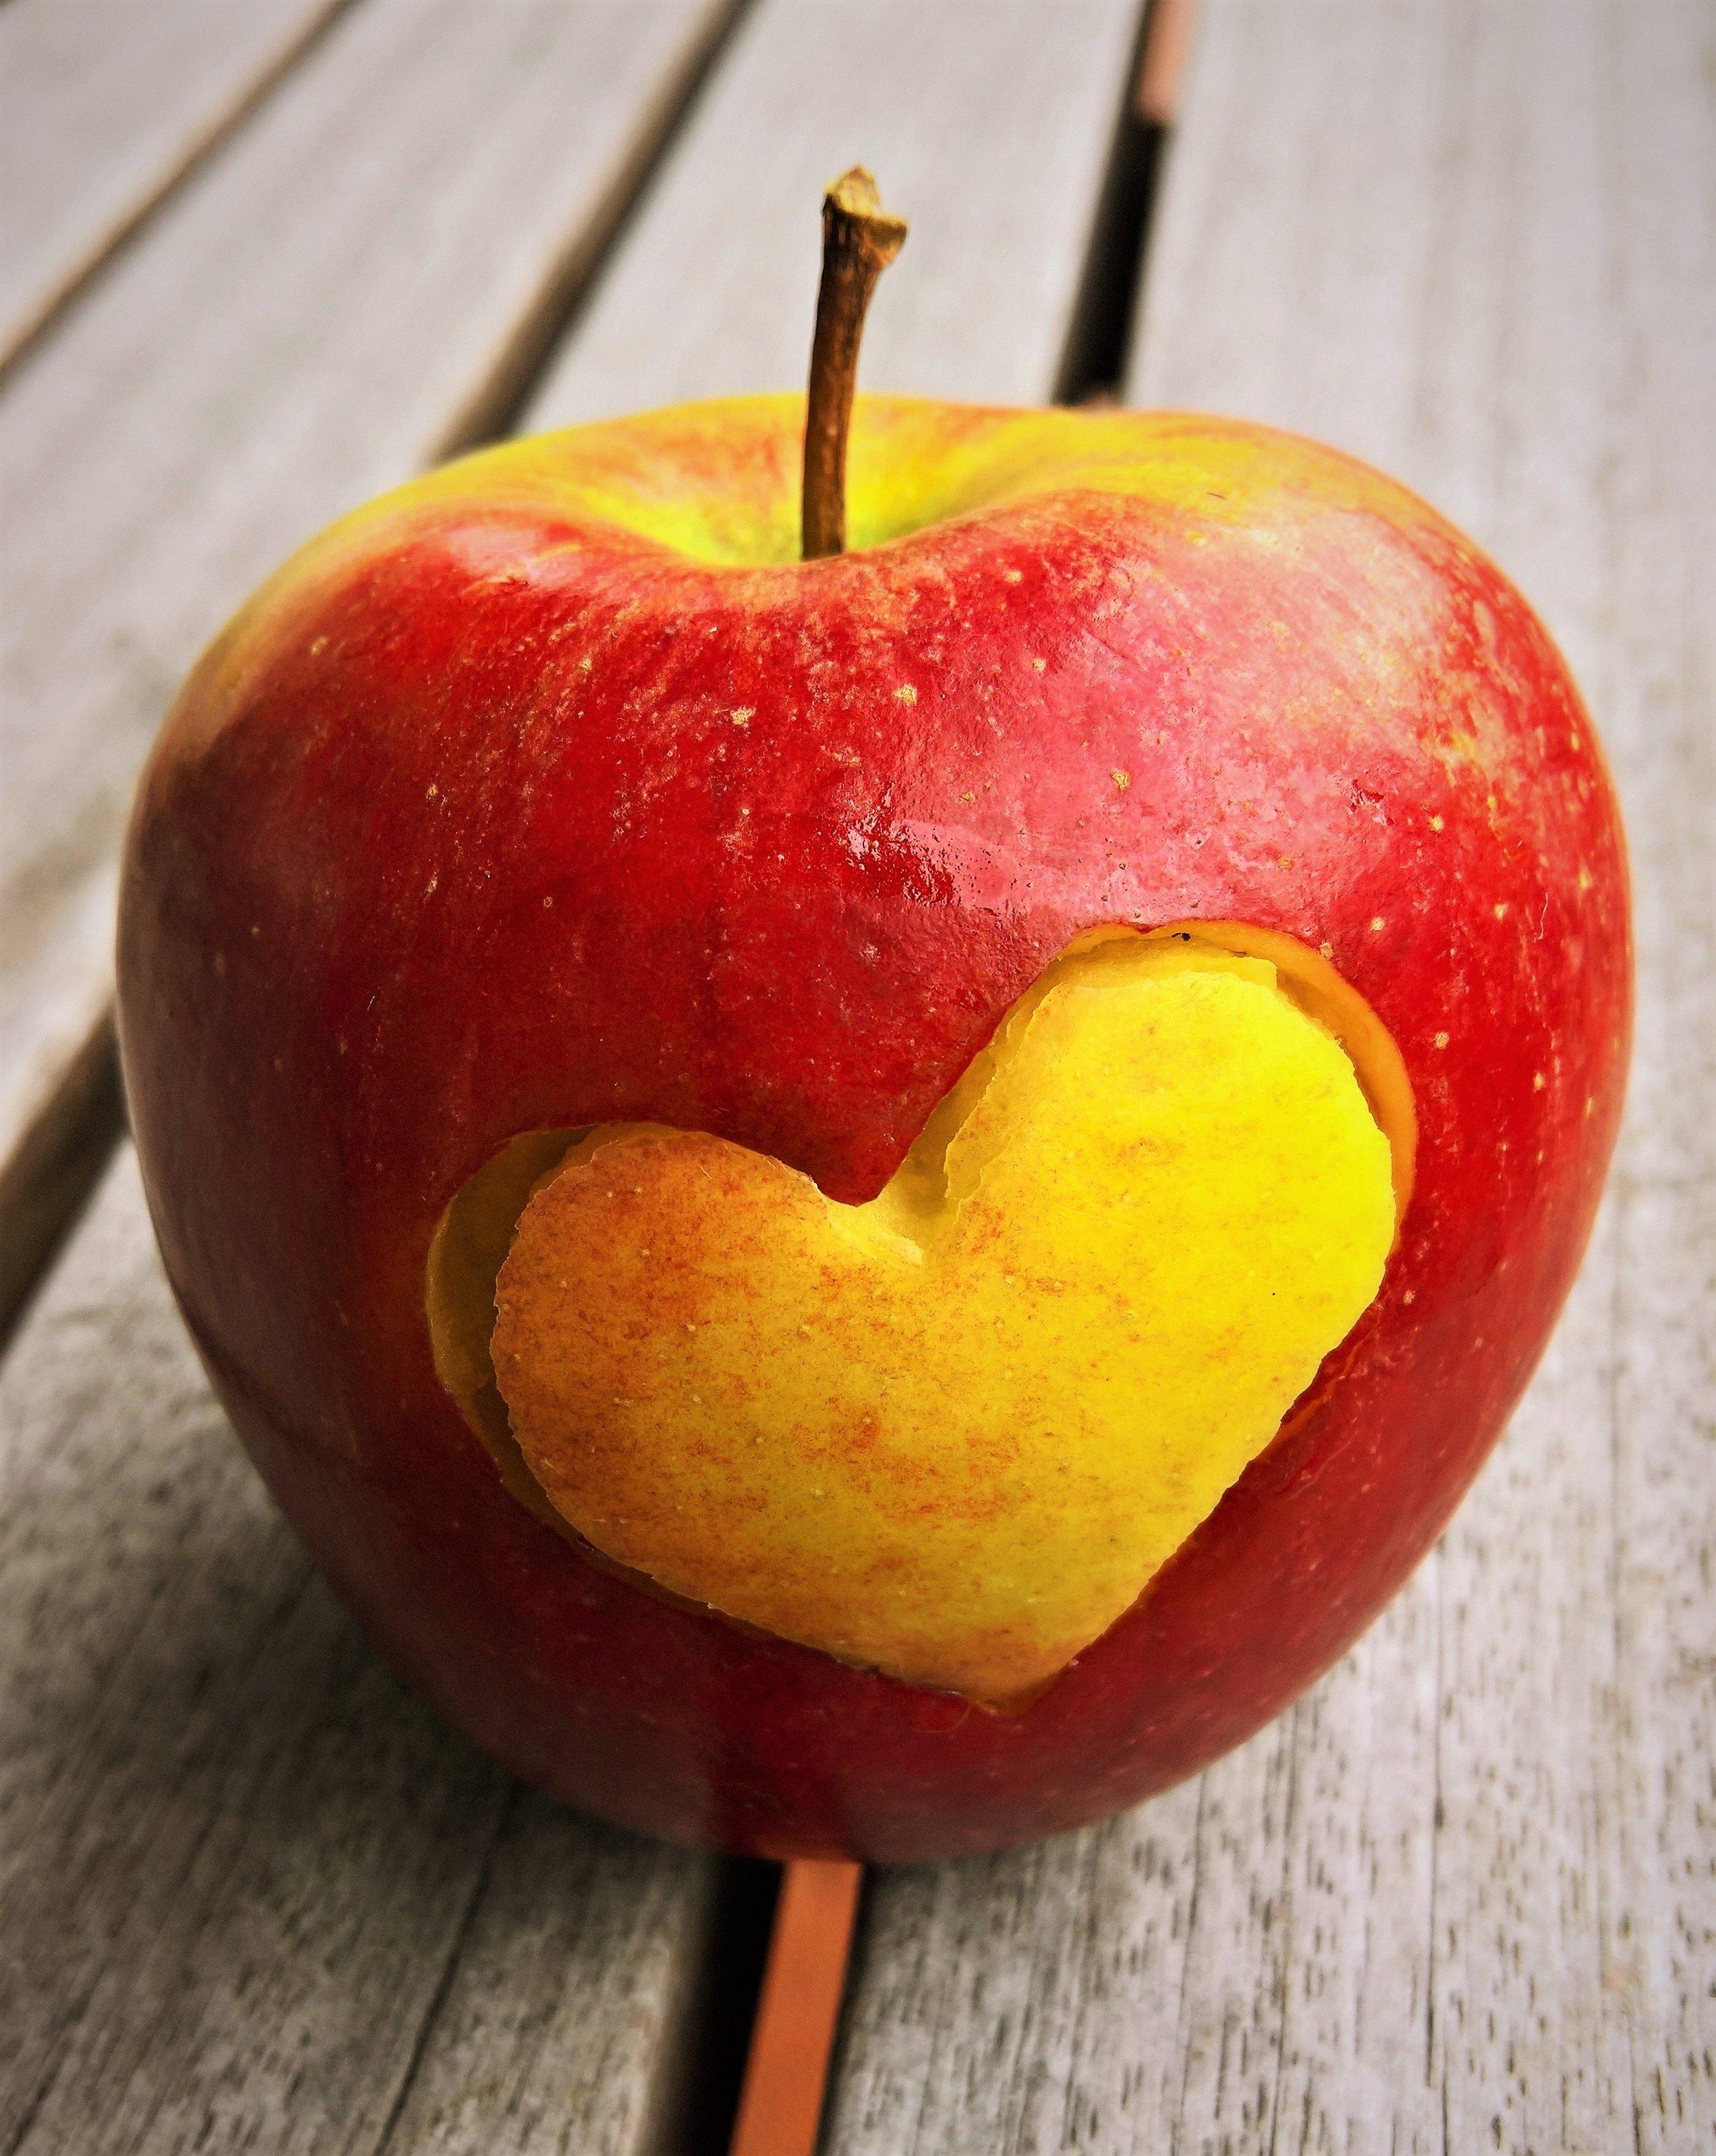 apple-bright-close-up-416443.jpg